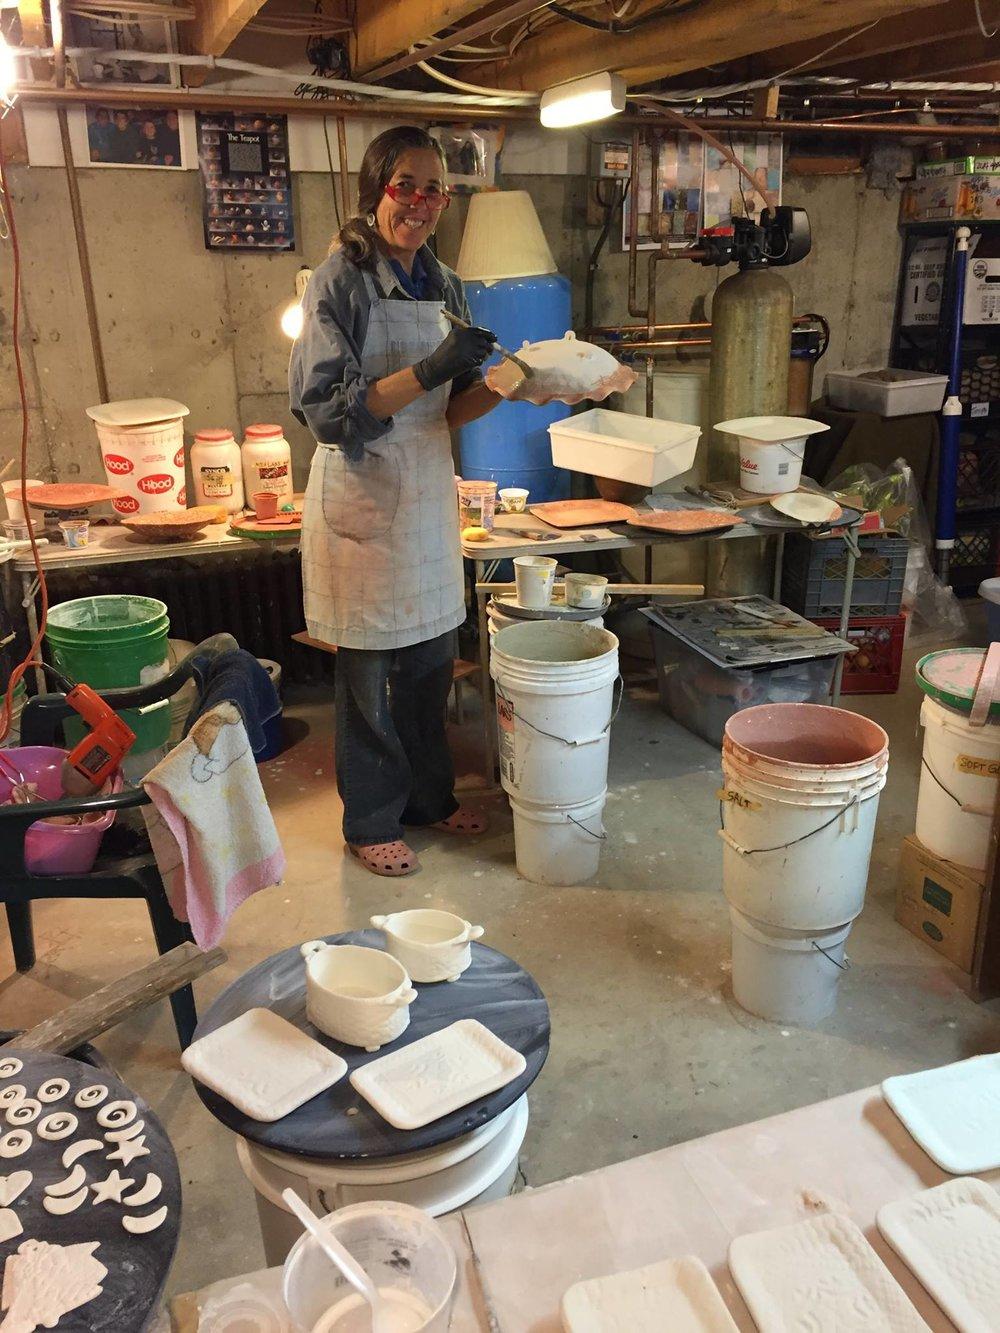 Jennifer in her ceramics studio applying glazes.